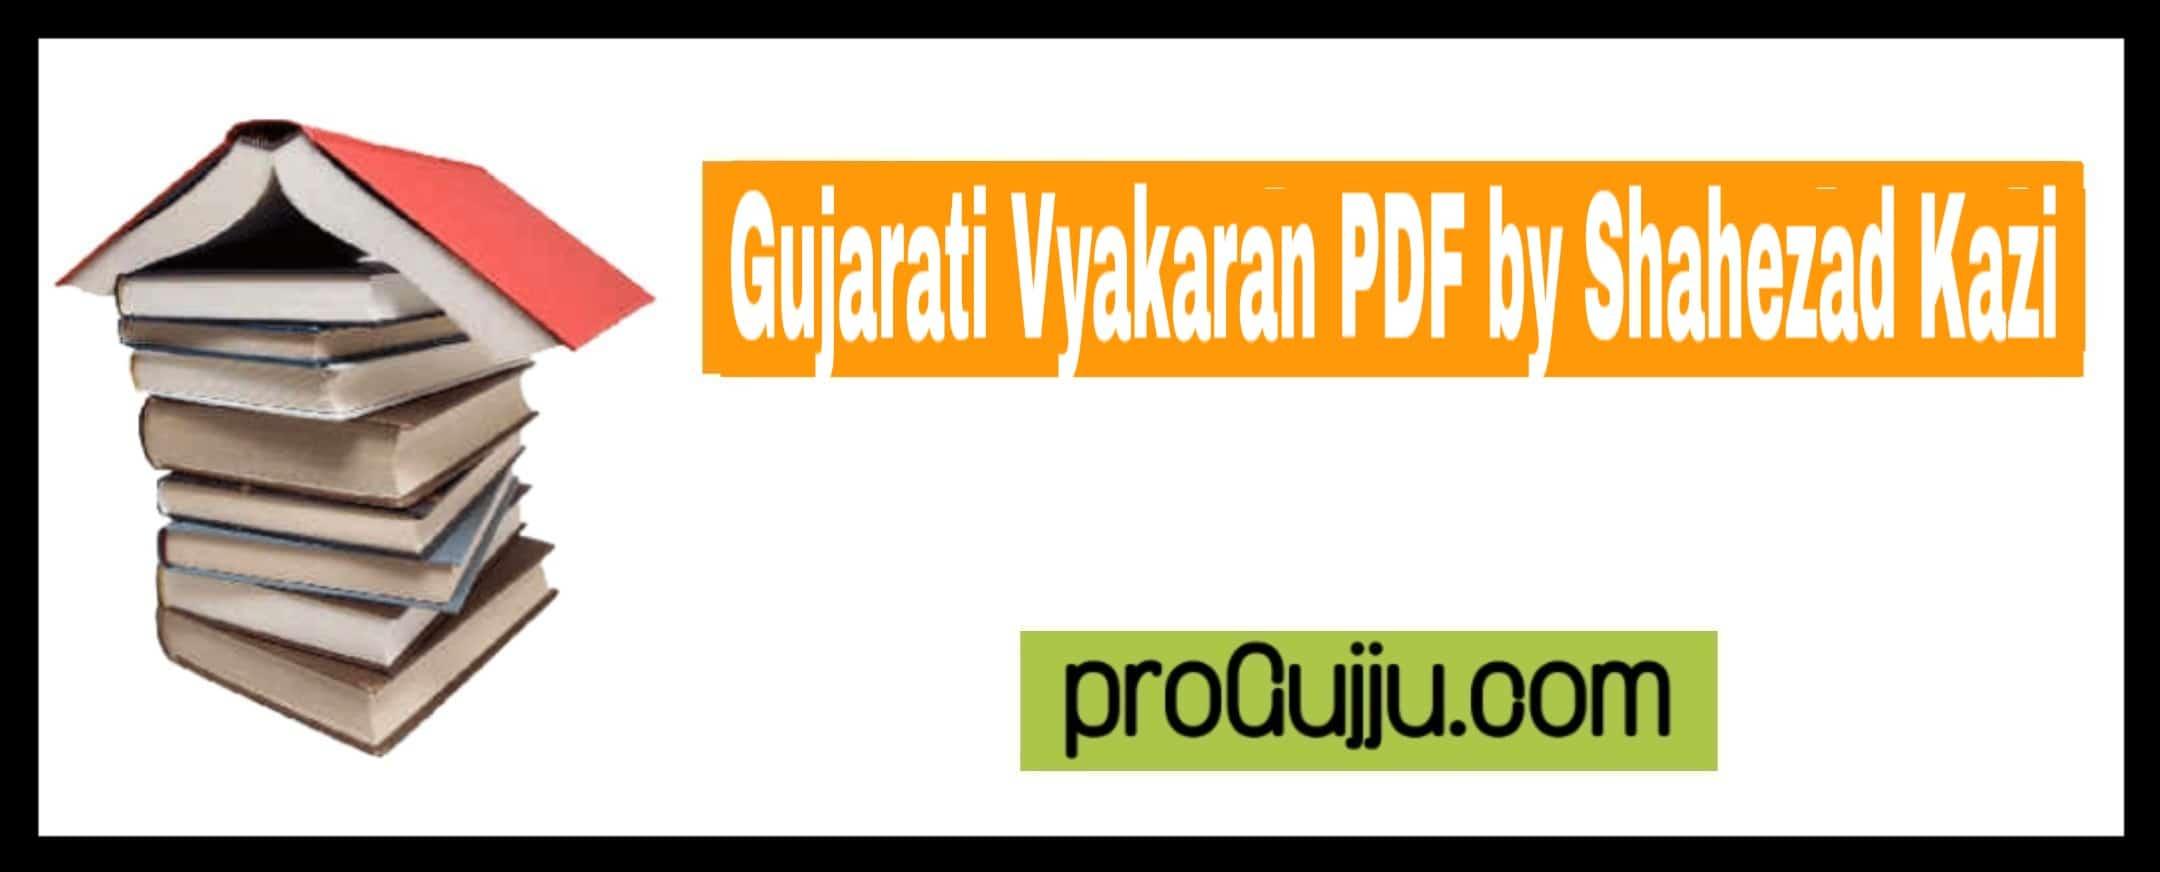 Gujarati Vyakaran pdf by Shahezad Kazi